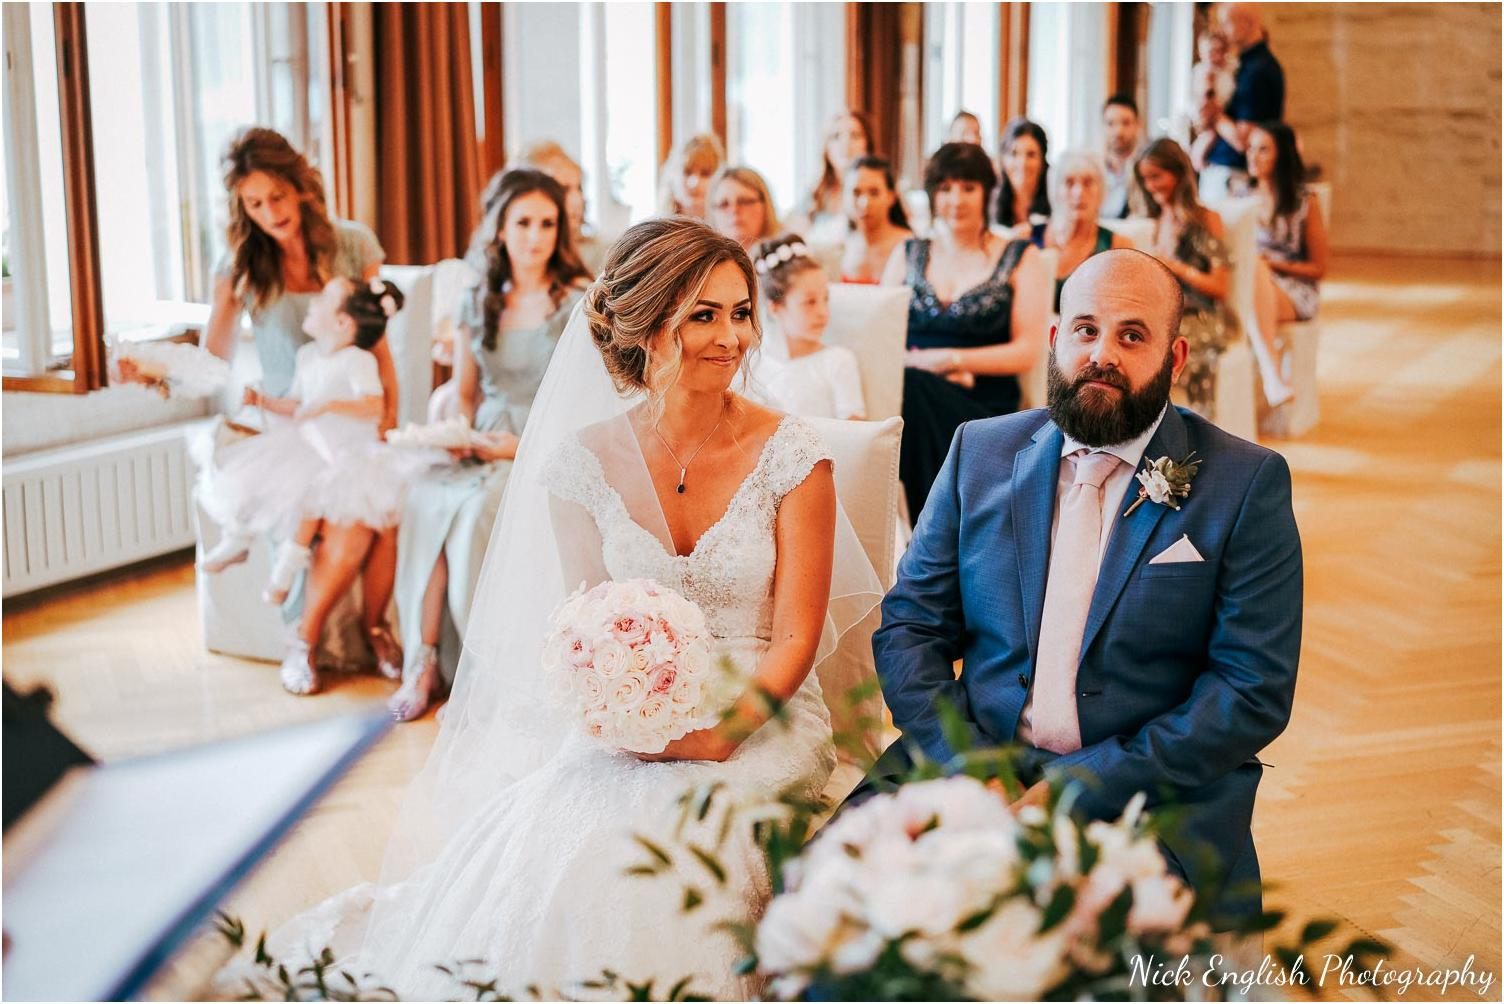 Destination_Wedding_Photographer_Slovenia_Nick_English_Photography-36.jpg